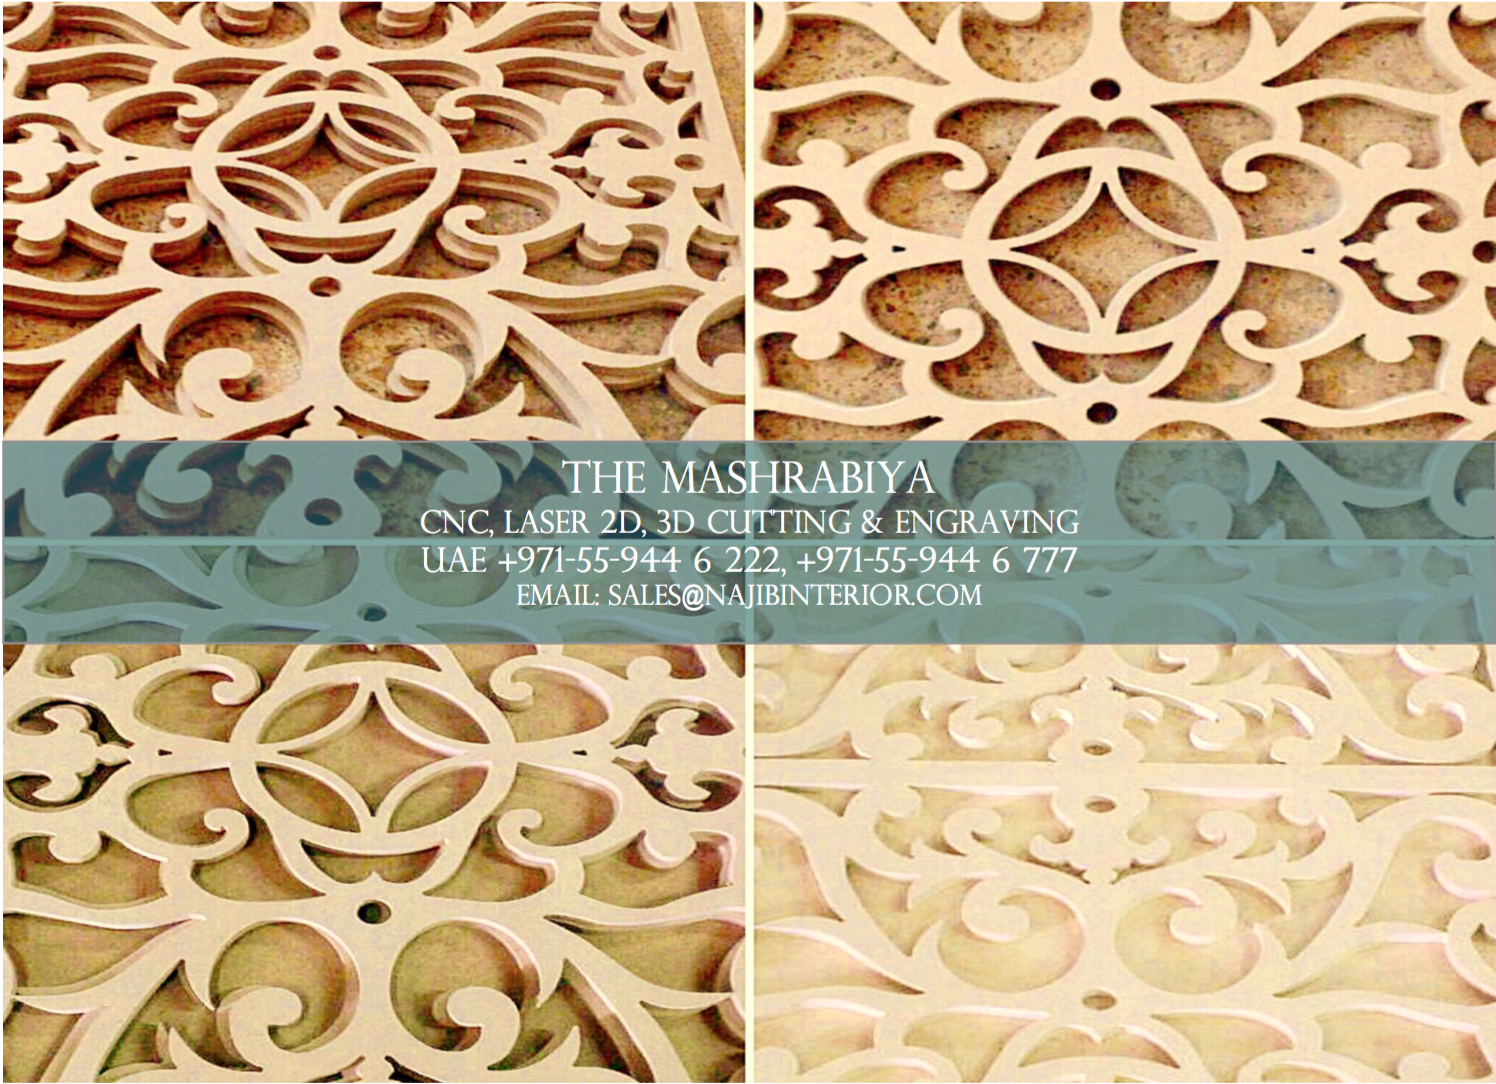 Pin von NID UAE (3D Walls) auf Mashrabiya | Pinterest